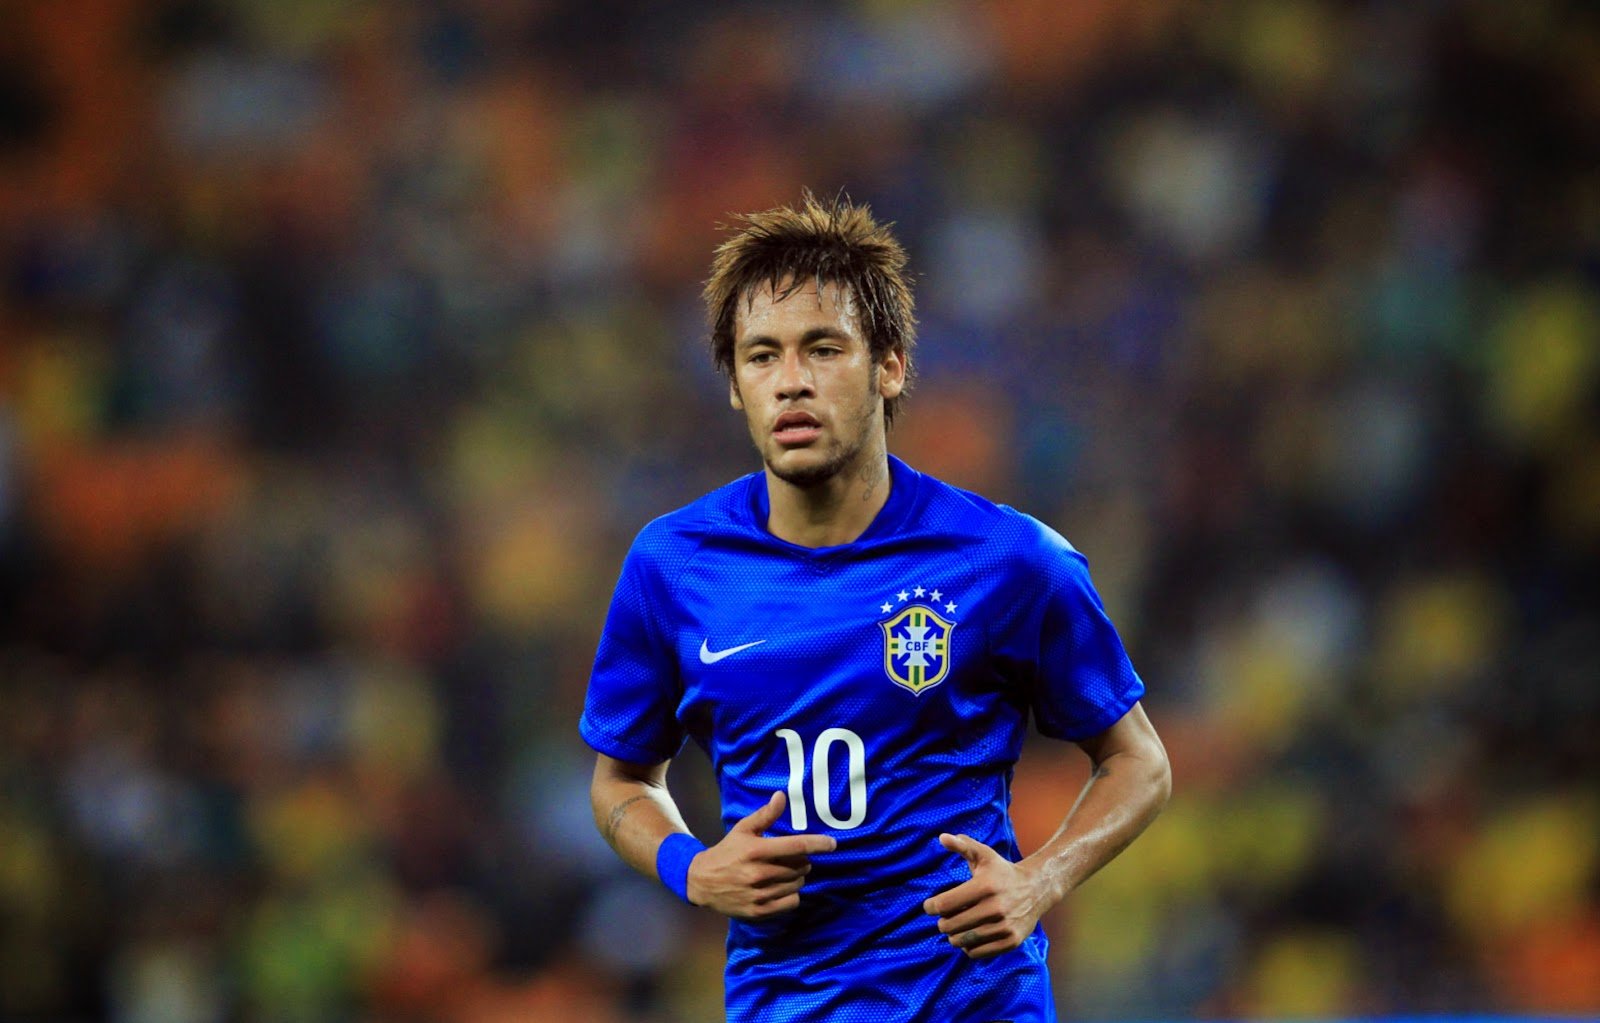 Football World Neymar Jr Brand New Hd Wallpapers 2014